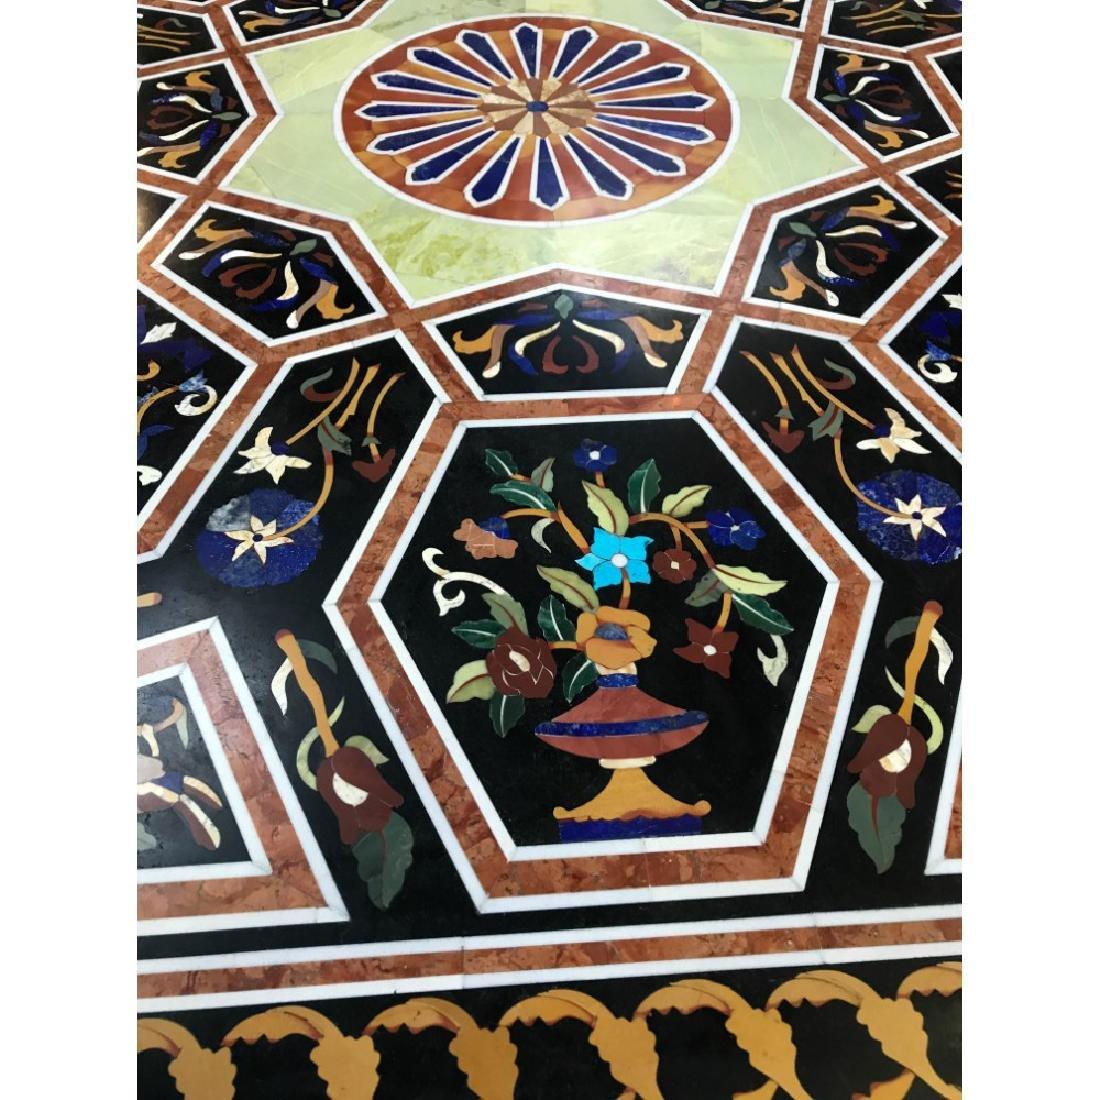 Mosaic Pietra Dura Octagon-Shaped Table - 8